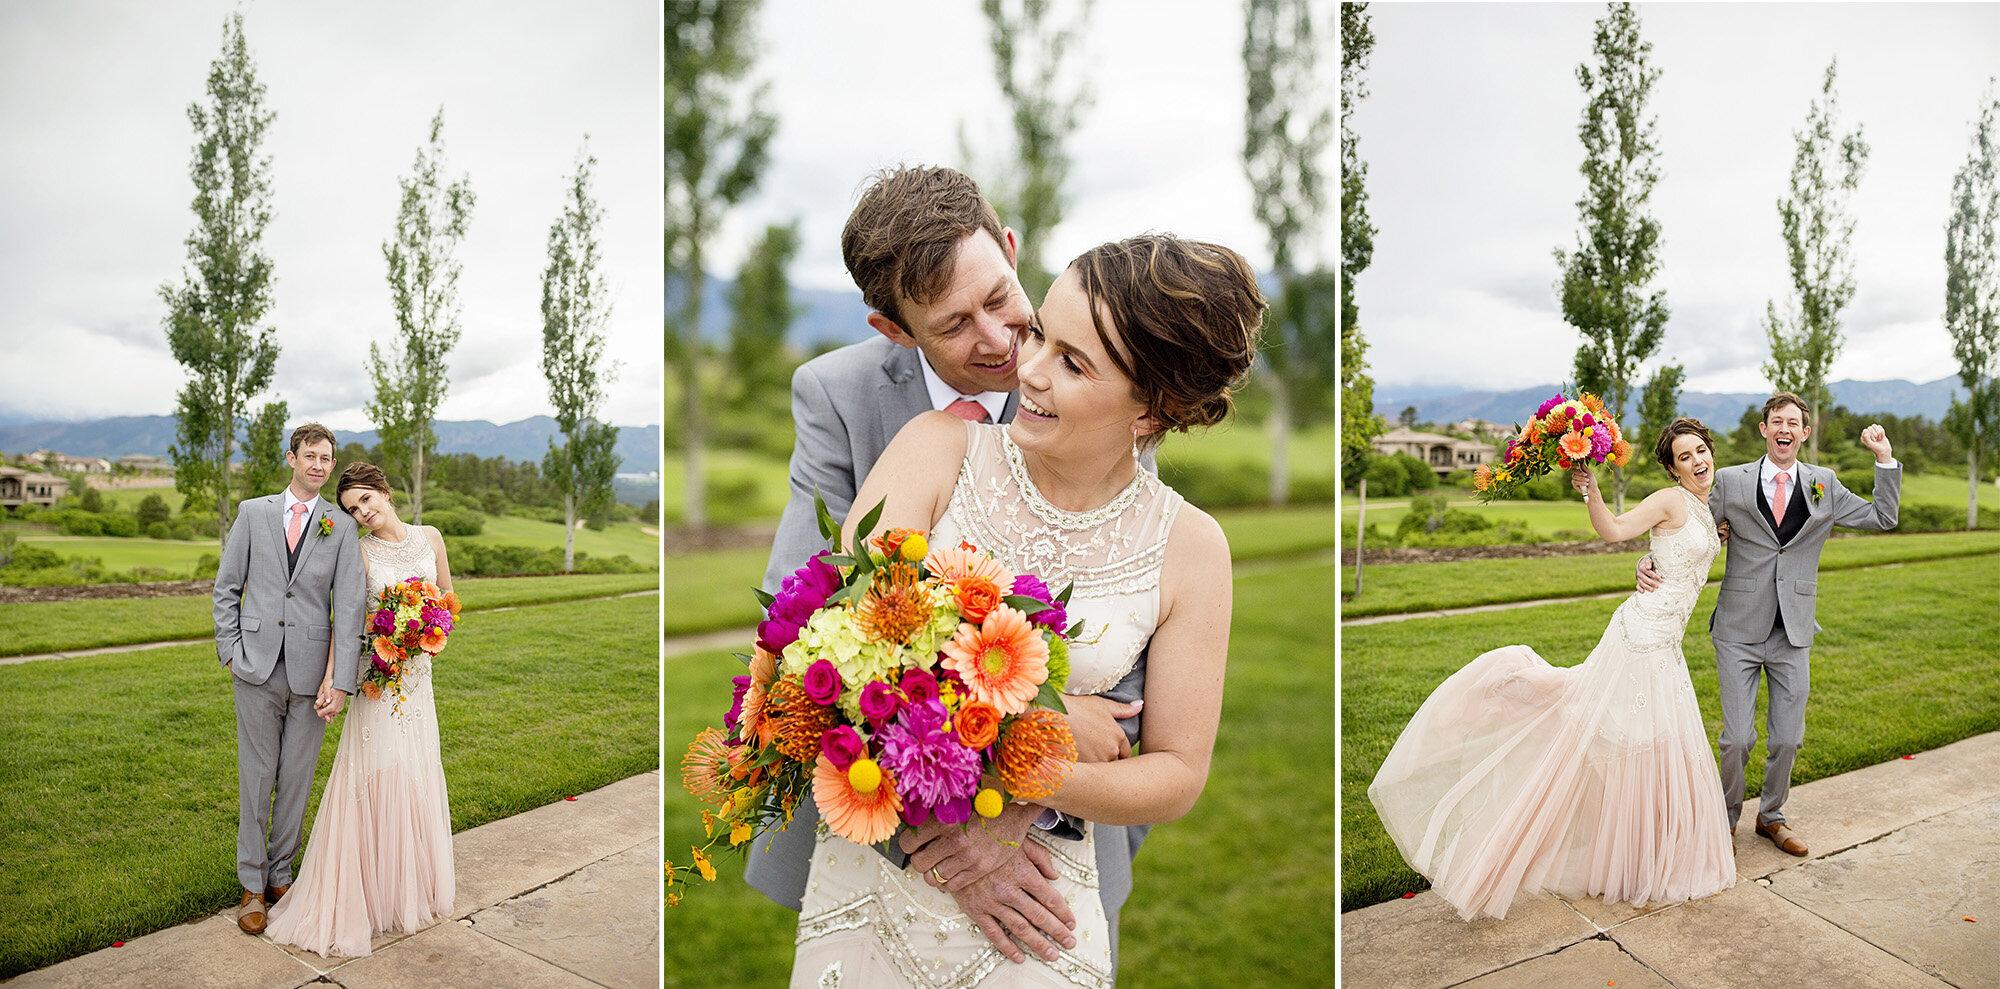 Seriously_Sabrina_Photography_Colorado_Springs_Club_at_Flying_Horse_Destination_Wedding_ODwyer70.jpg